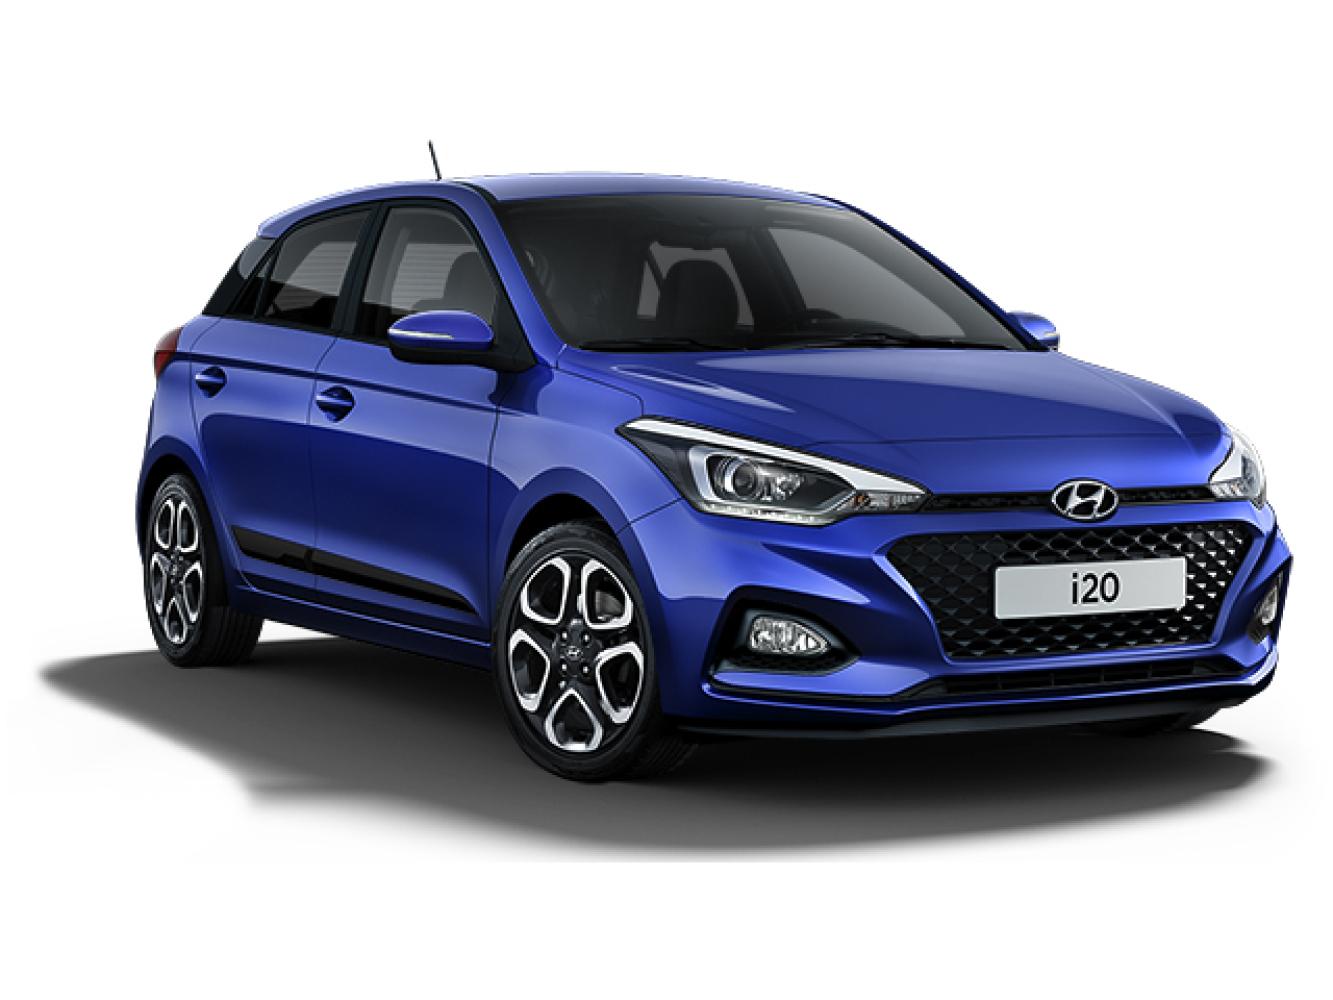 Hyundai Lease Deals >> New Hyundai i20 1.2 Mpi Premium Nav 5Dr Petrol Hatchback for Sale   Bristol Street